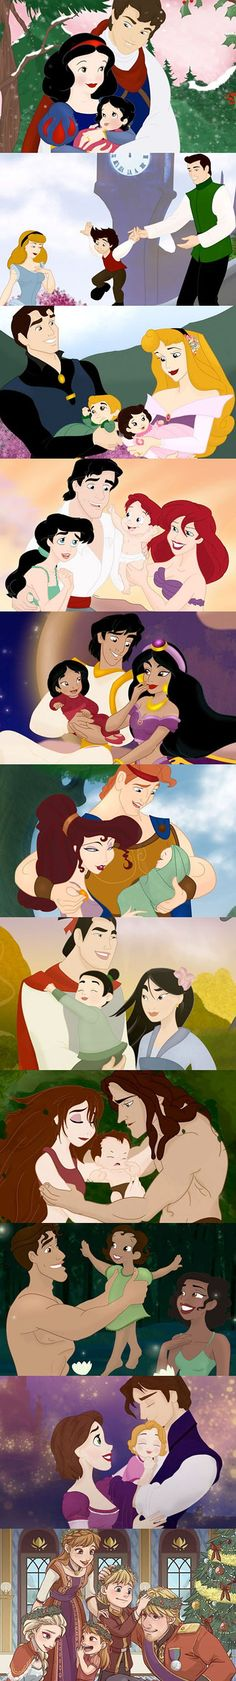 Disney Children - Kids of Disney Princes and Princesses - Cosmopolitan